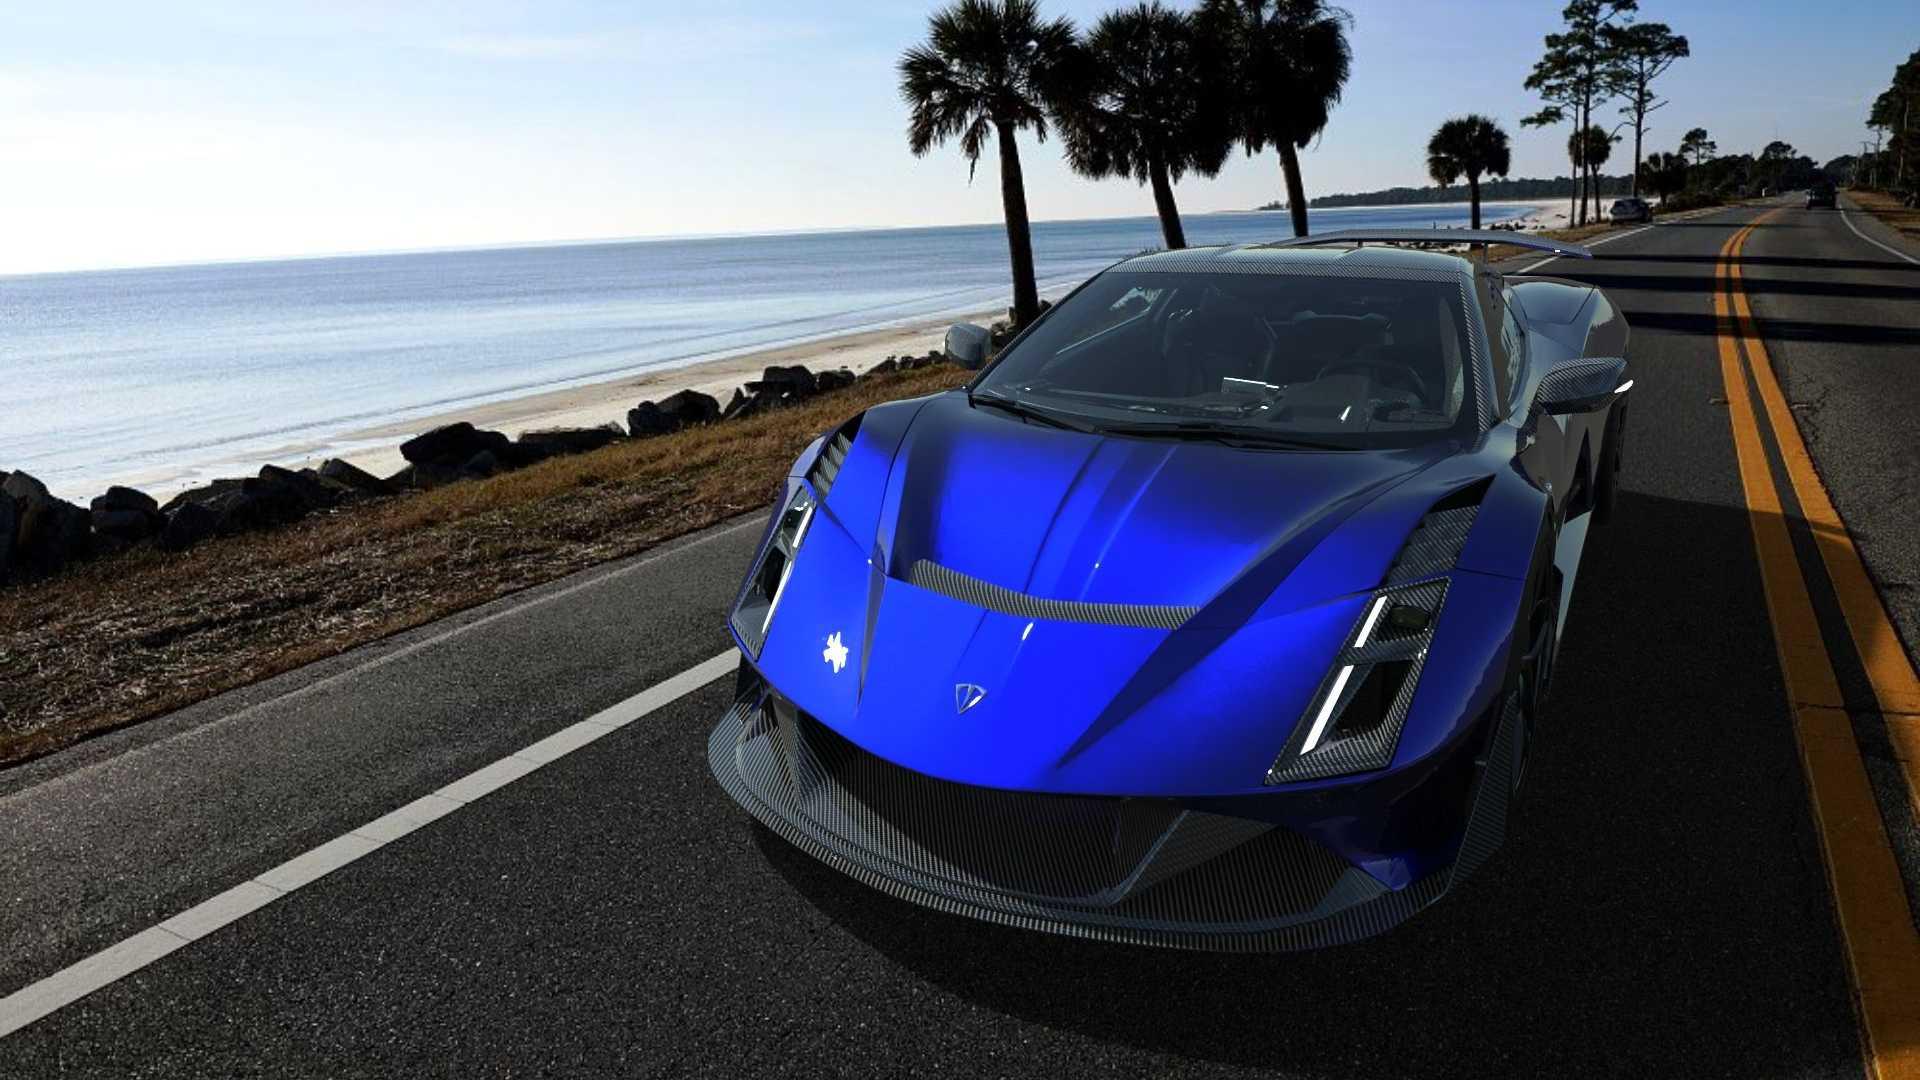 Arrera-Automobili-Illyrian-Pure-Sport-Renderings-12